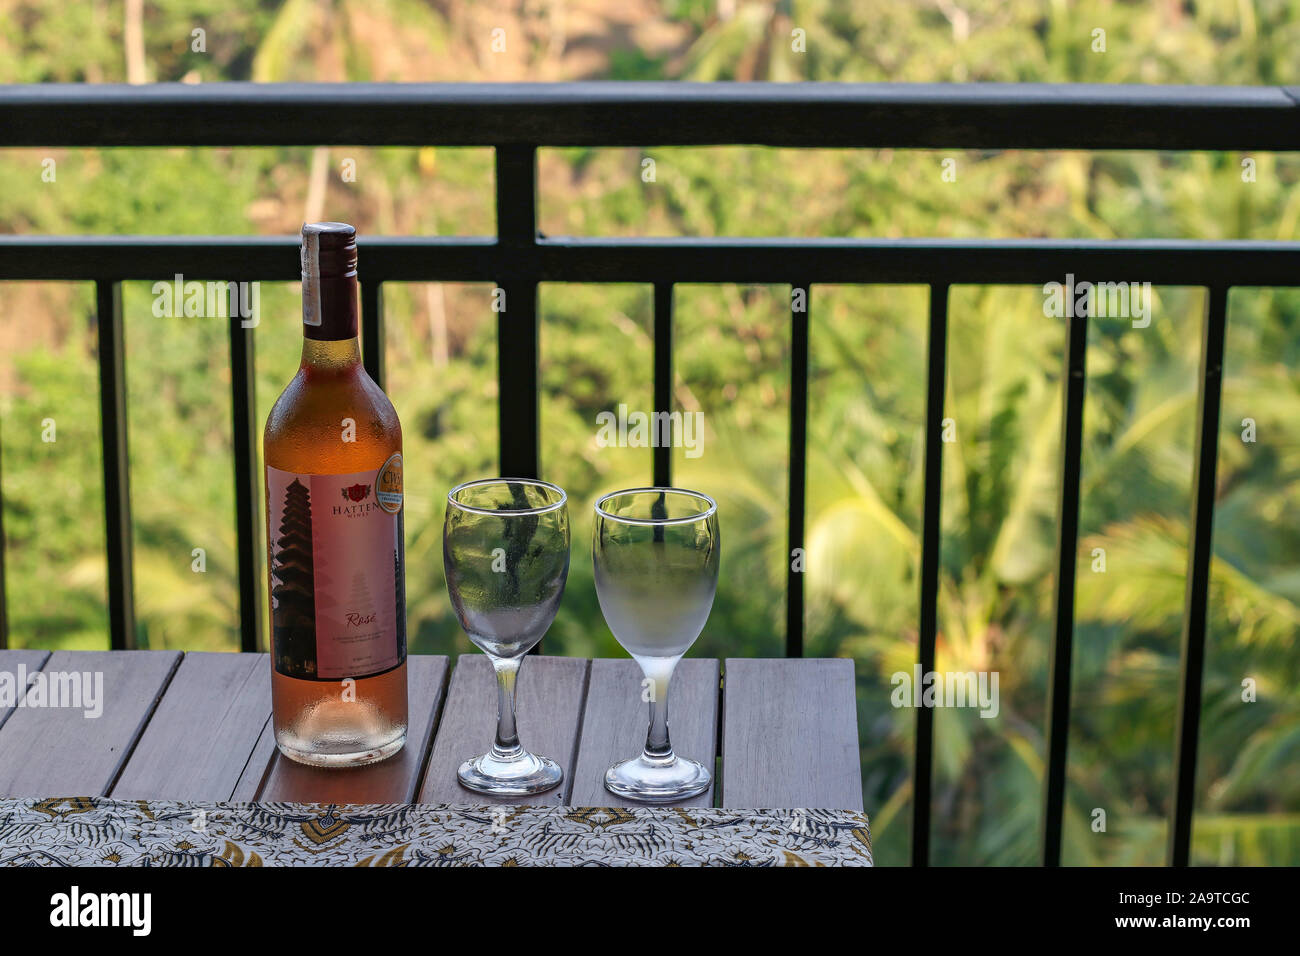 10 14 2019 Ubud Bali Indonesia A Bottle Of Rose Wine And